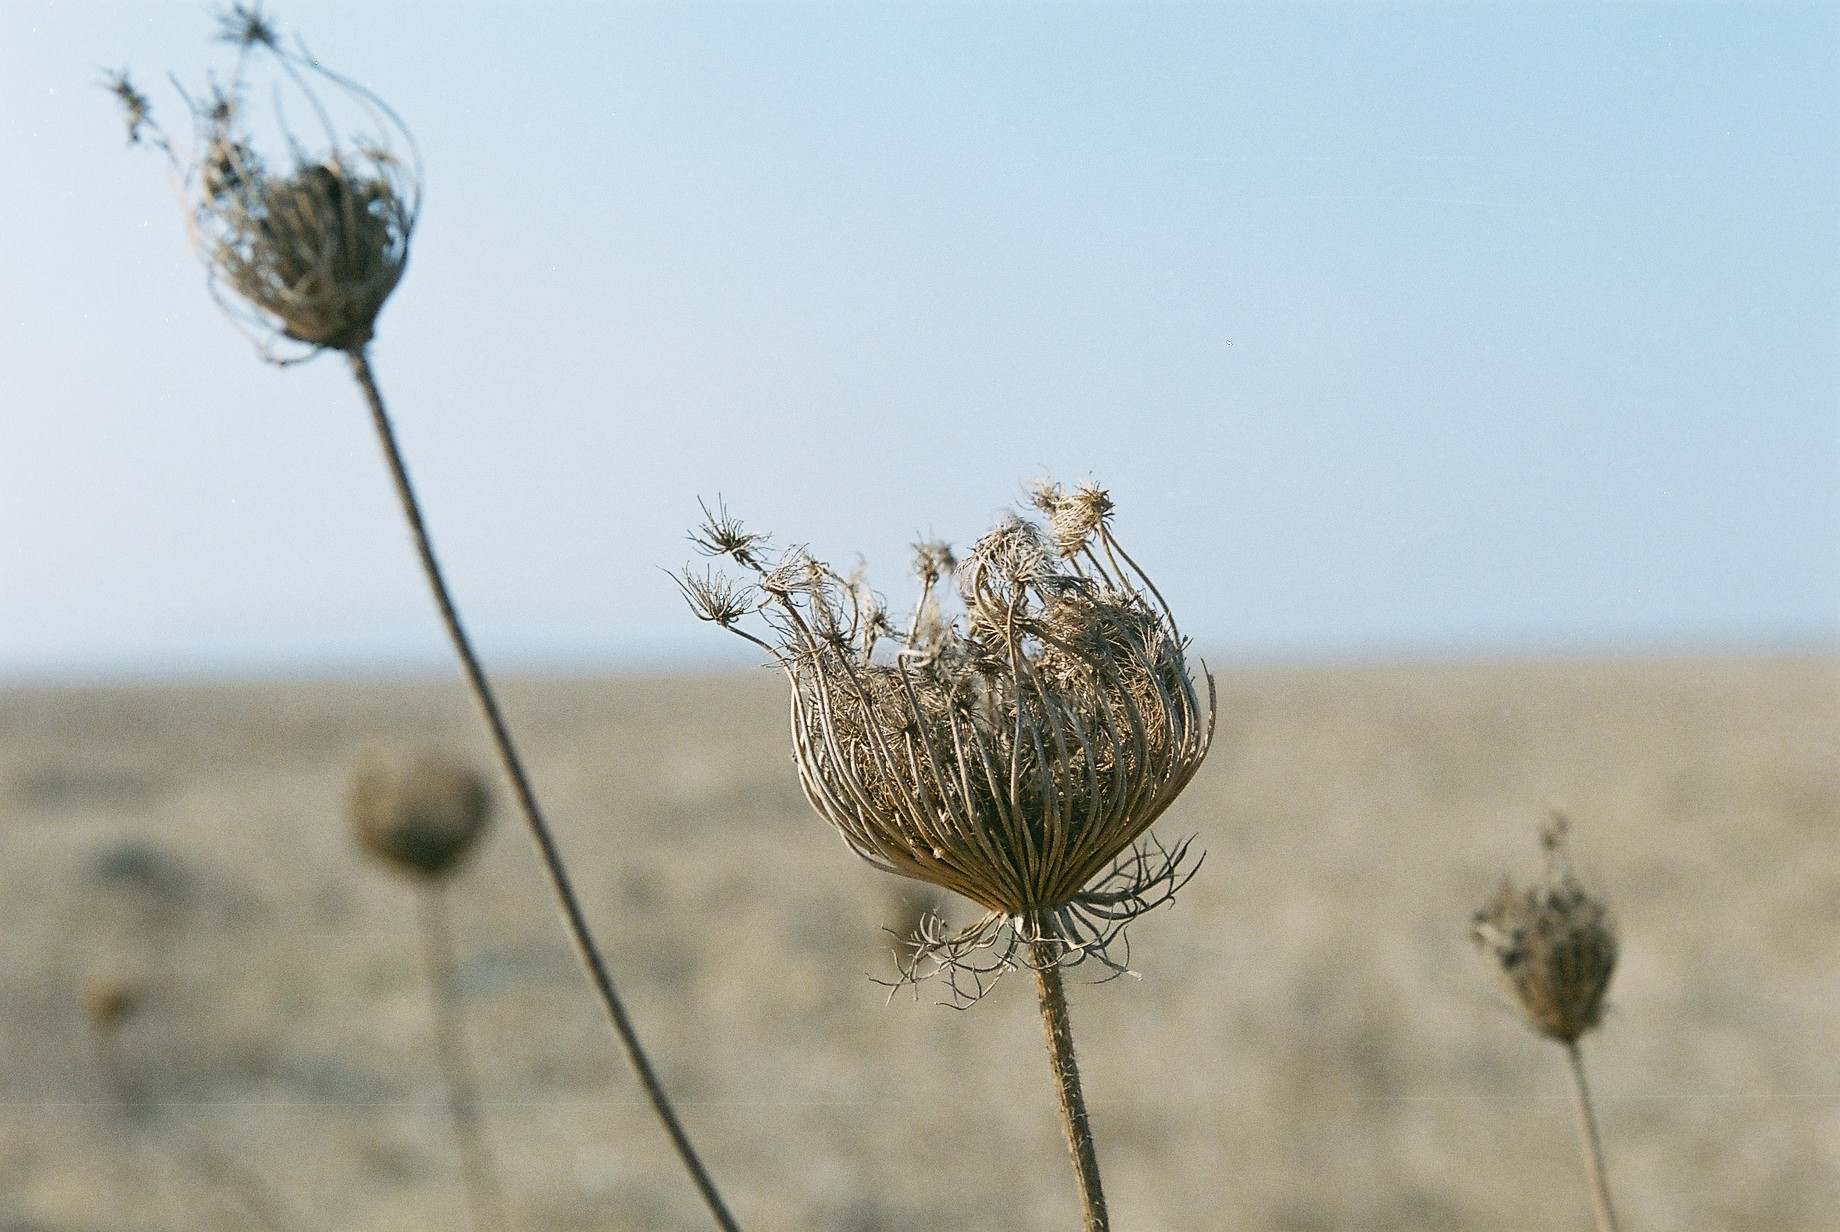 Dry Thorn Film Arielzuk